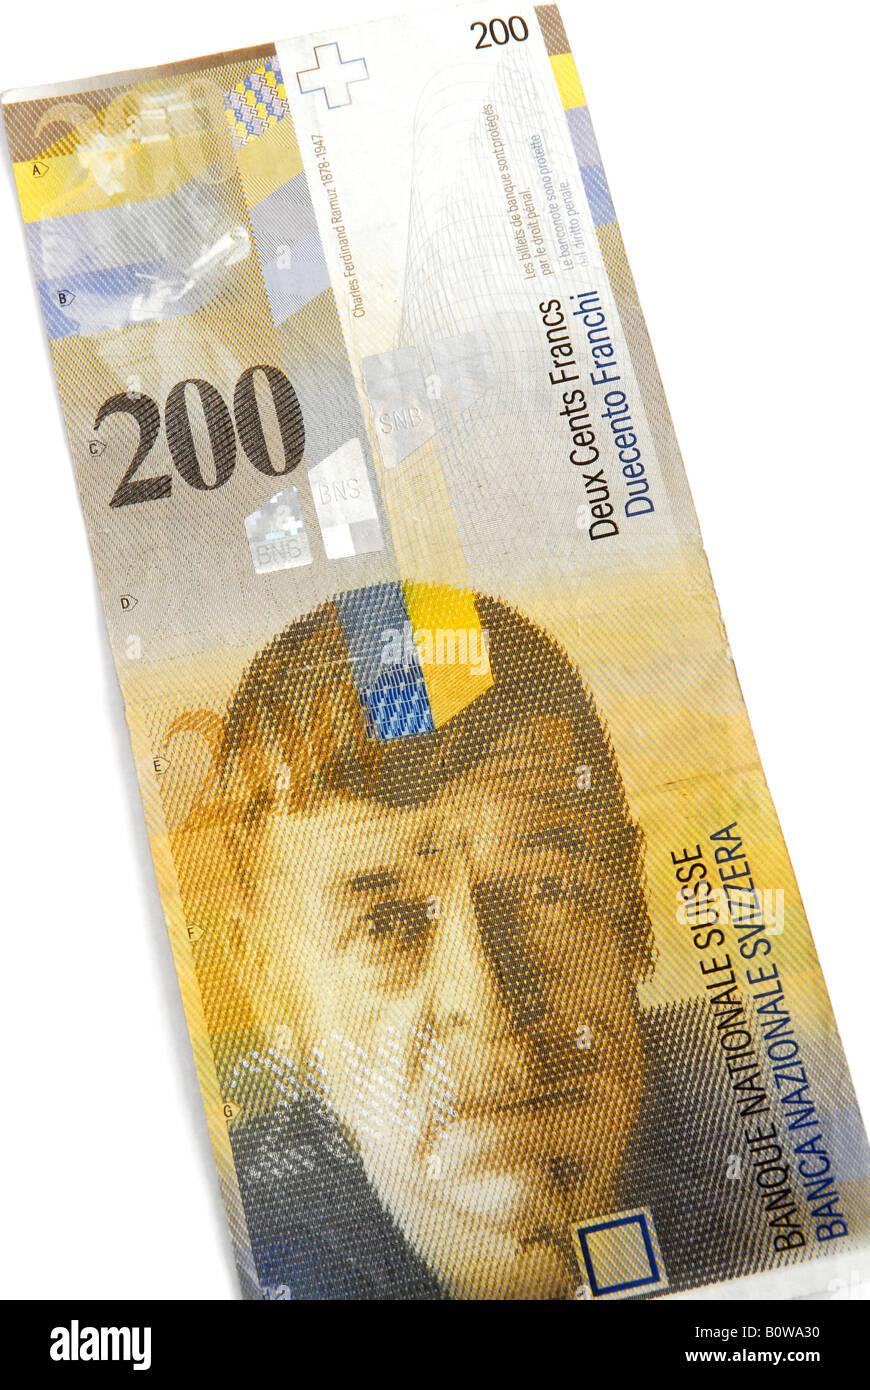 Billet De 200 Francs : billet, francs, Billet, Francs, Suisses,, Projet, Photo, Stock, Alamy